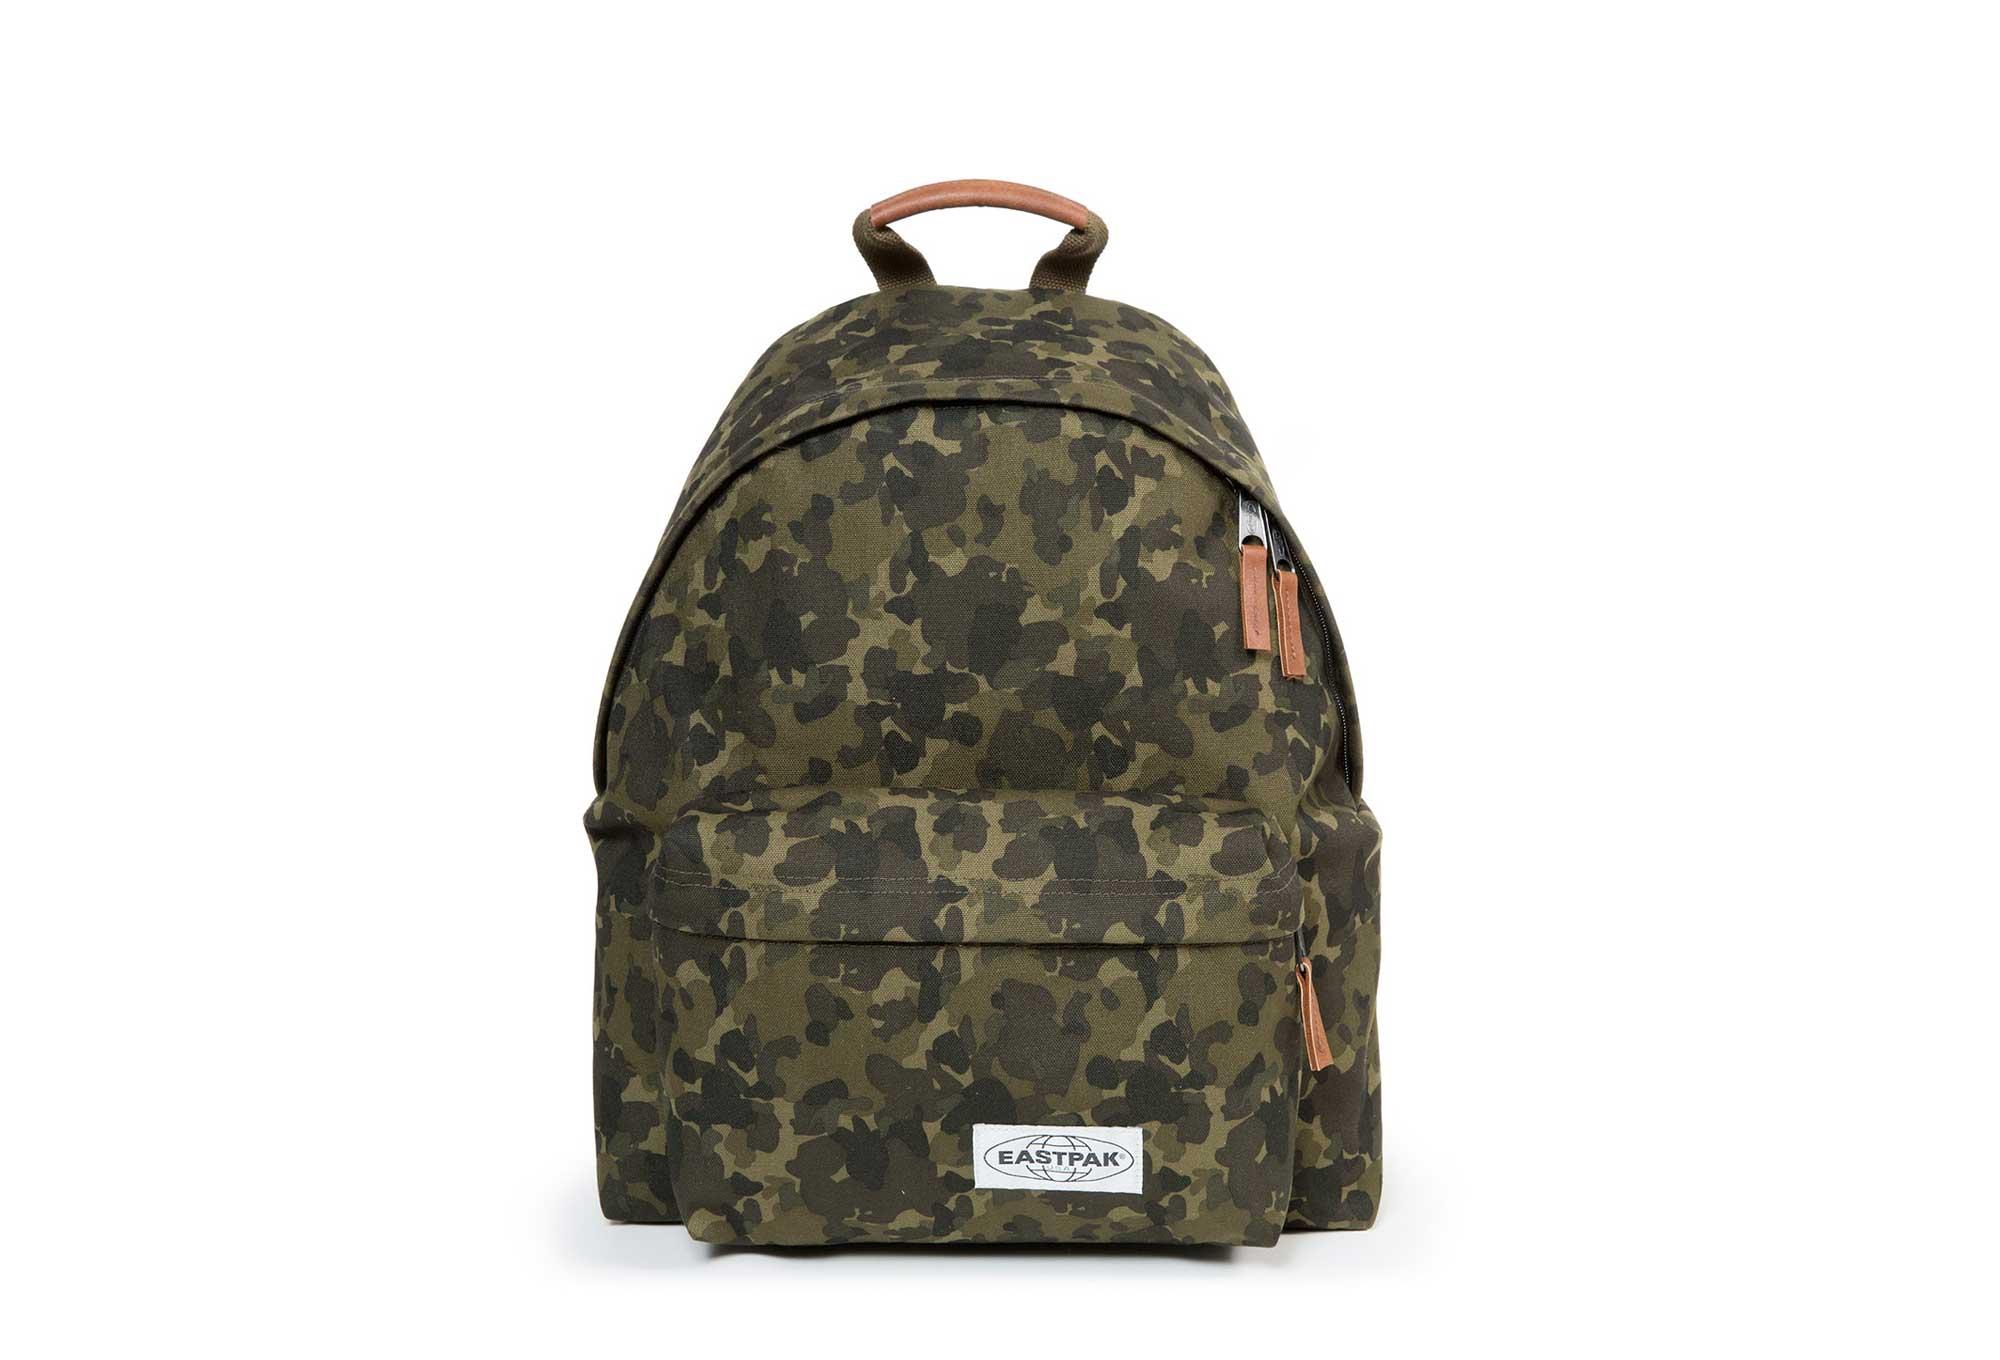 ea98f4ec2f9 Eastpak Padded Pak'r Opgrade Camo Backpack | Alltricks.com